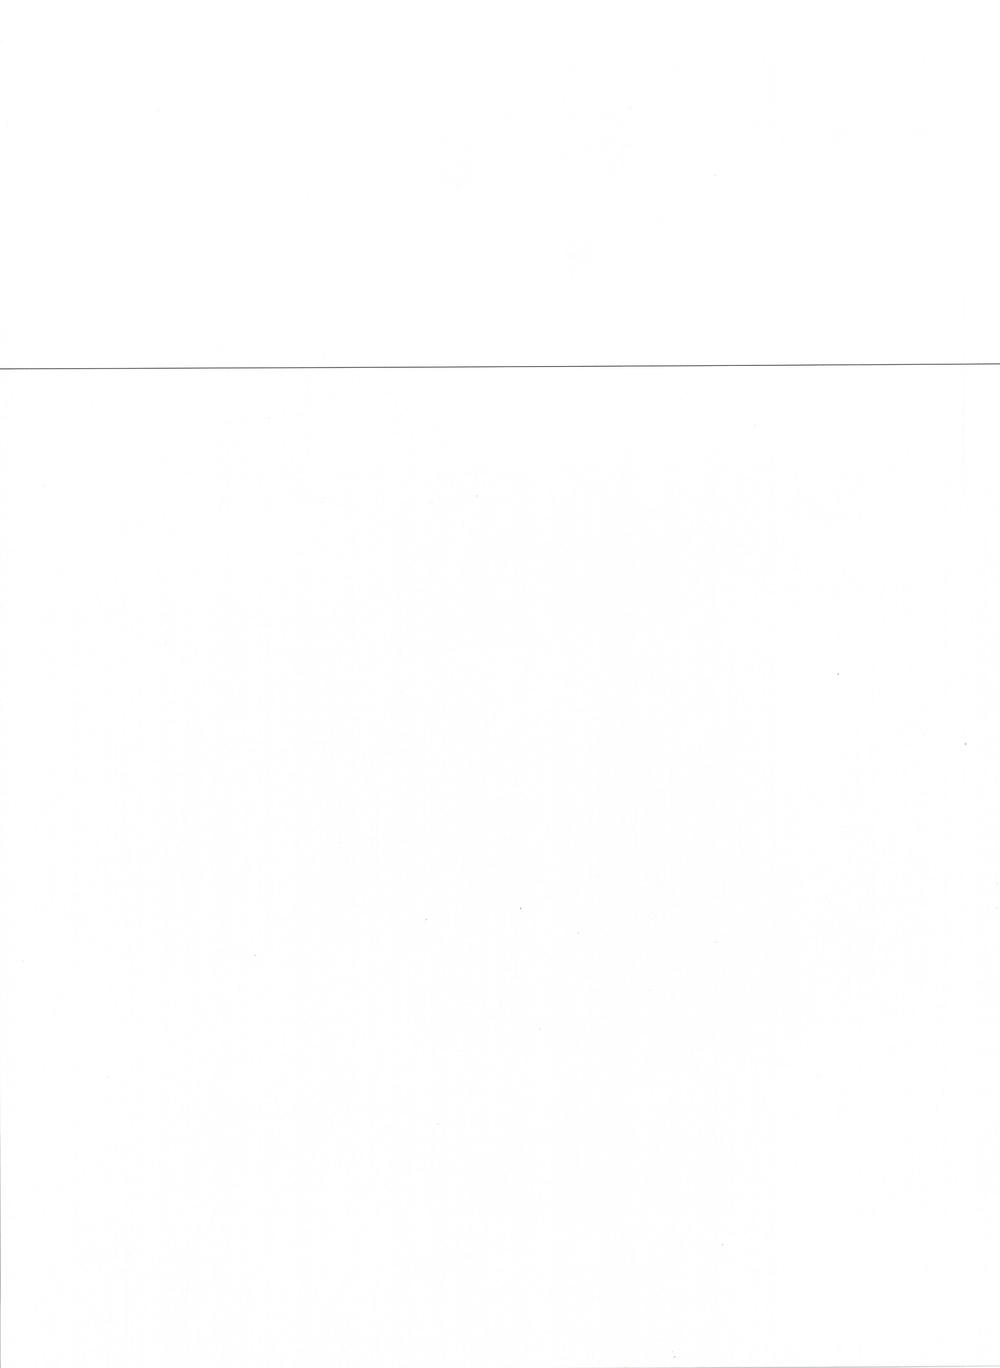 Signatures2014-2015_final-10 copy.jpg